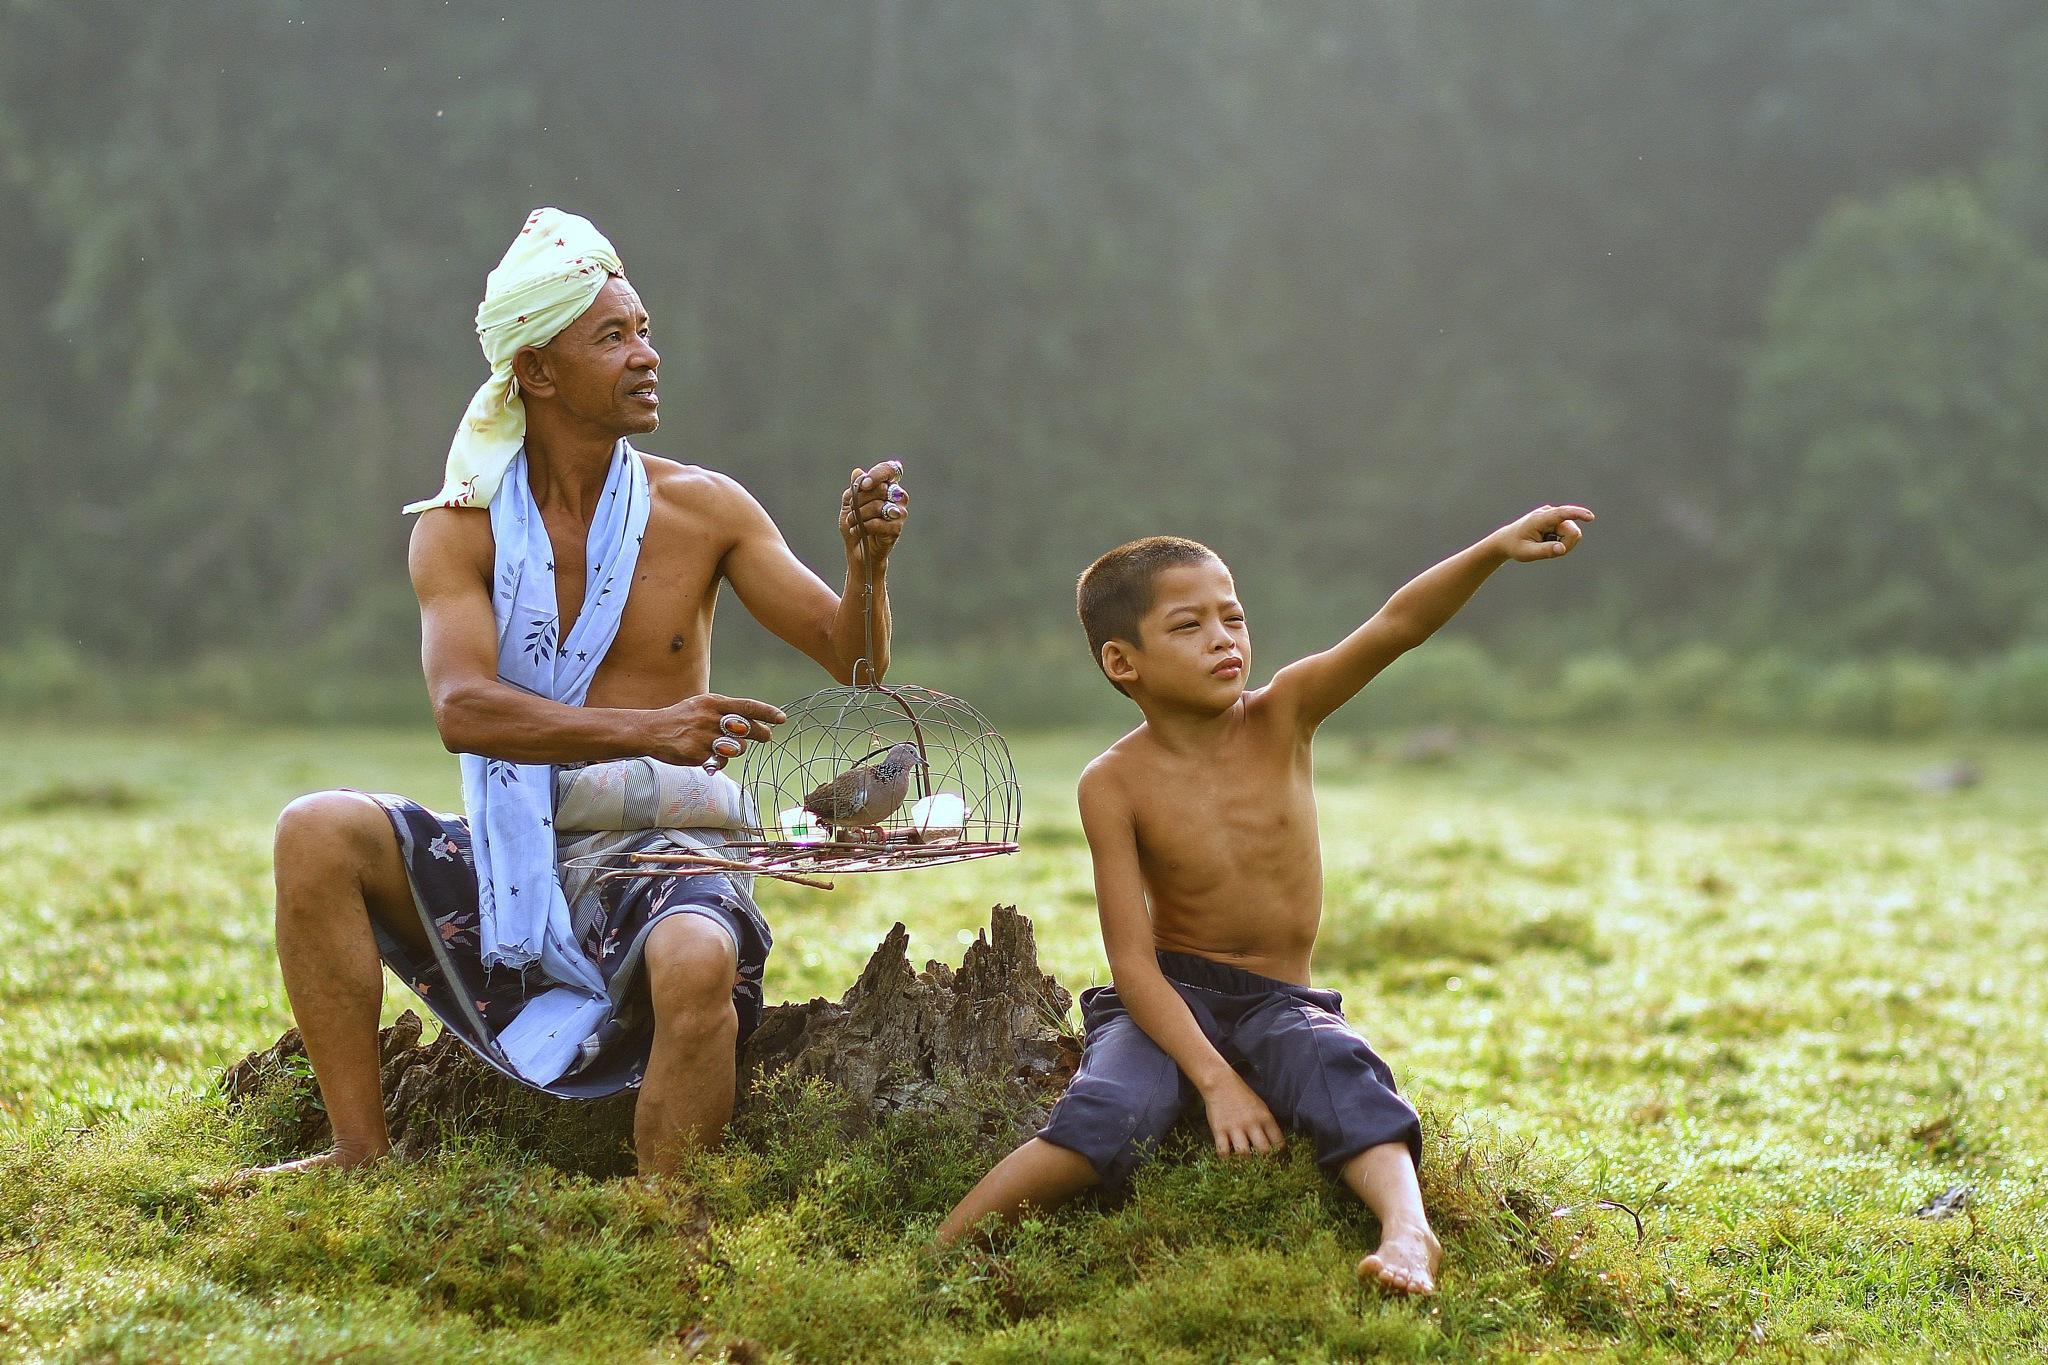 Father and Son by Dallah Deen Mohd Zain